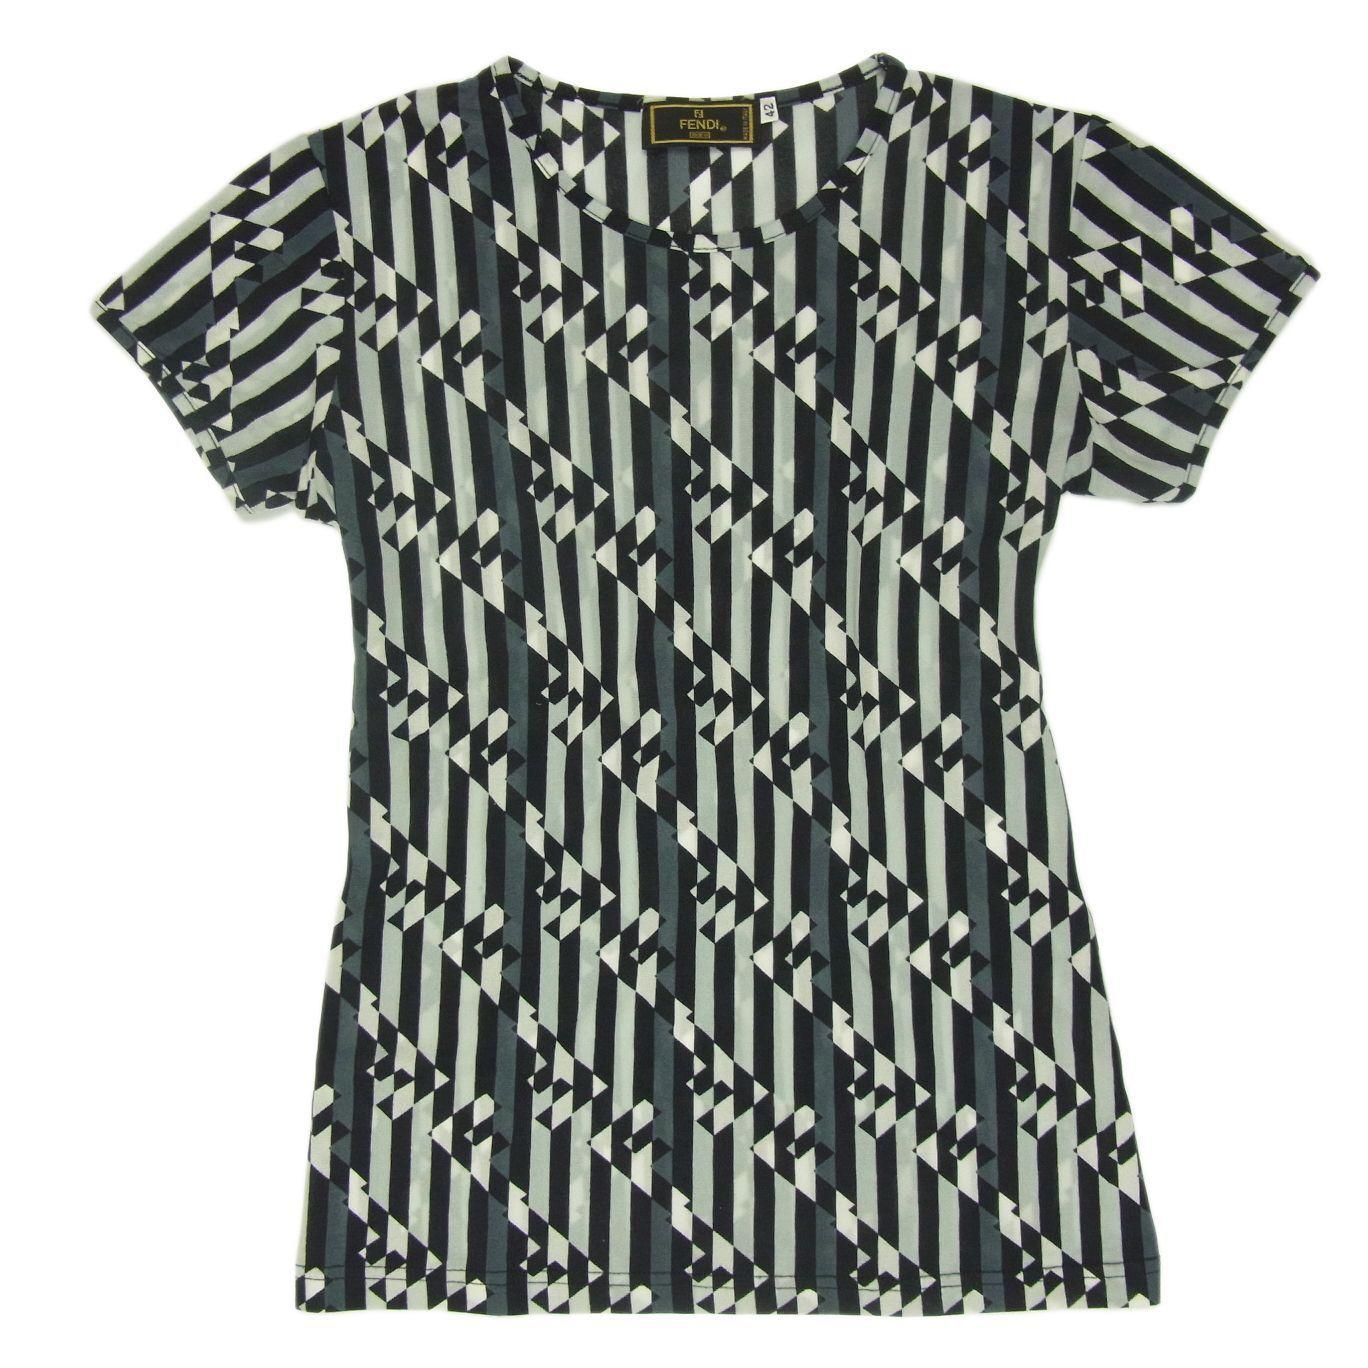 Auth FENDI Logos Striped Pattern Stretchable T Shirt Top Sz 42 US M F S 2118